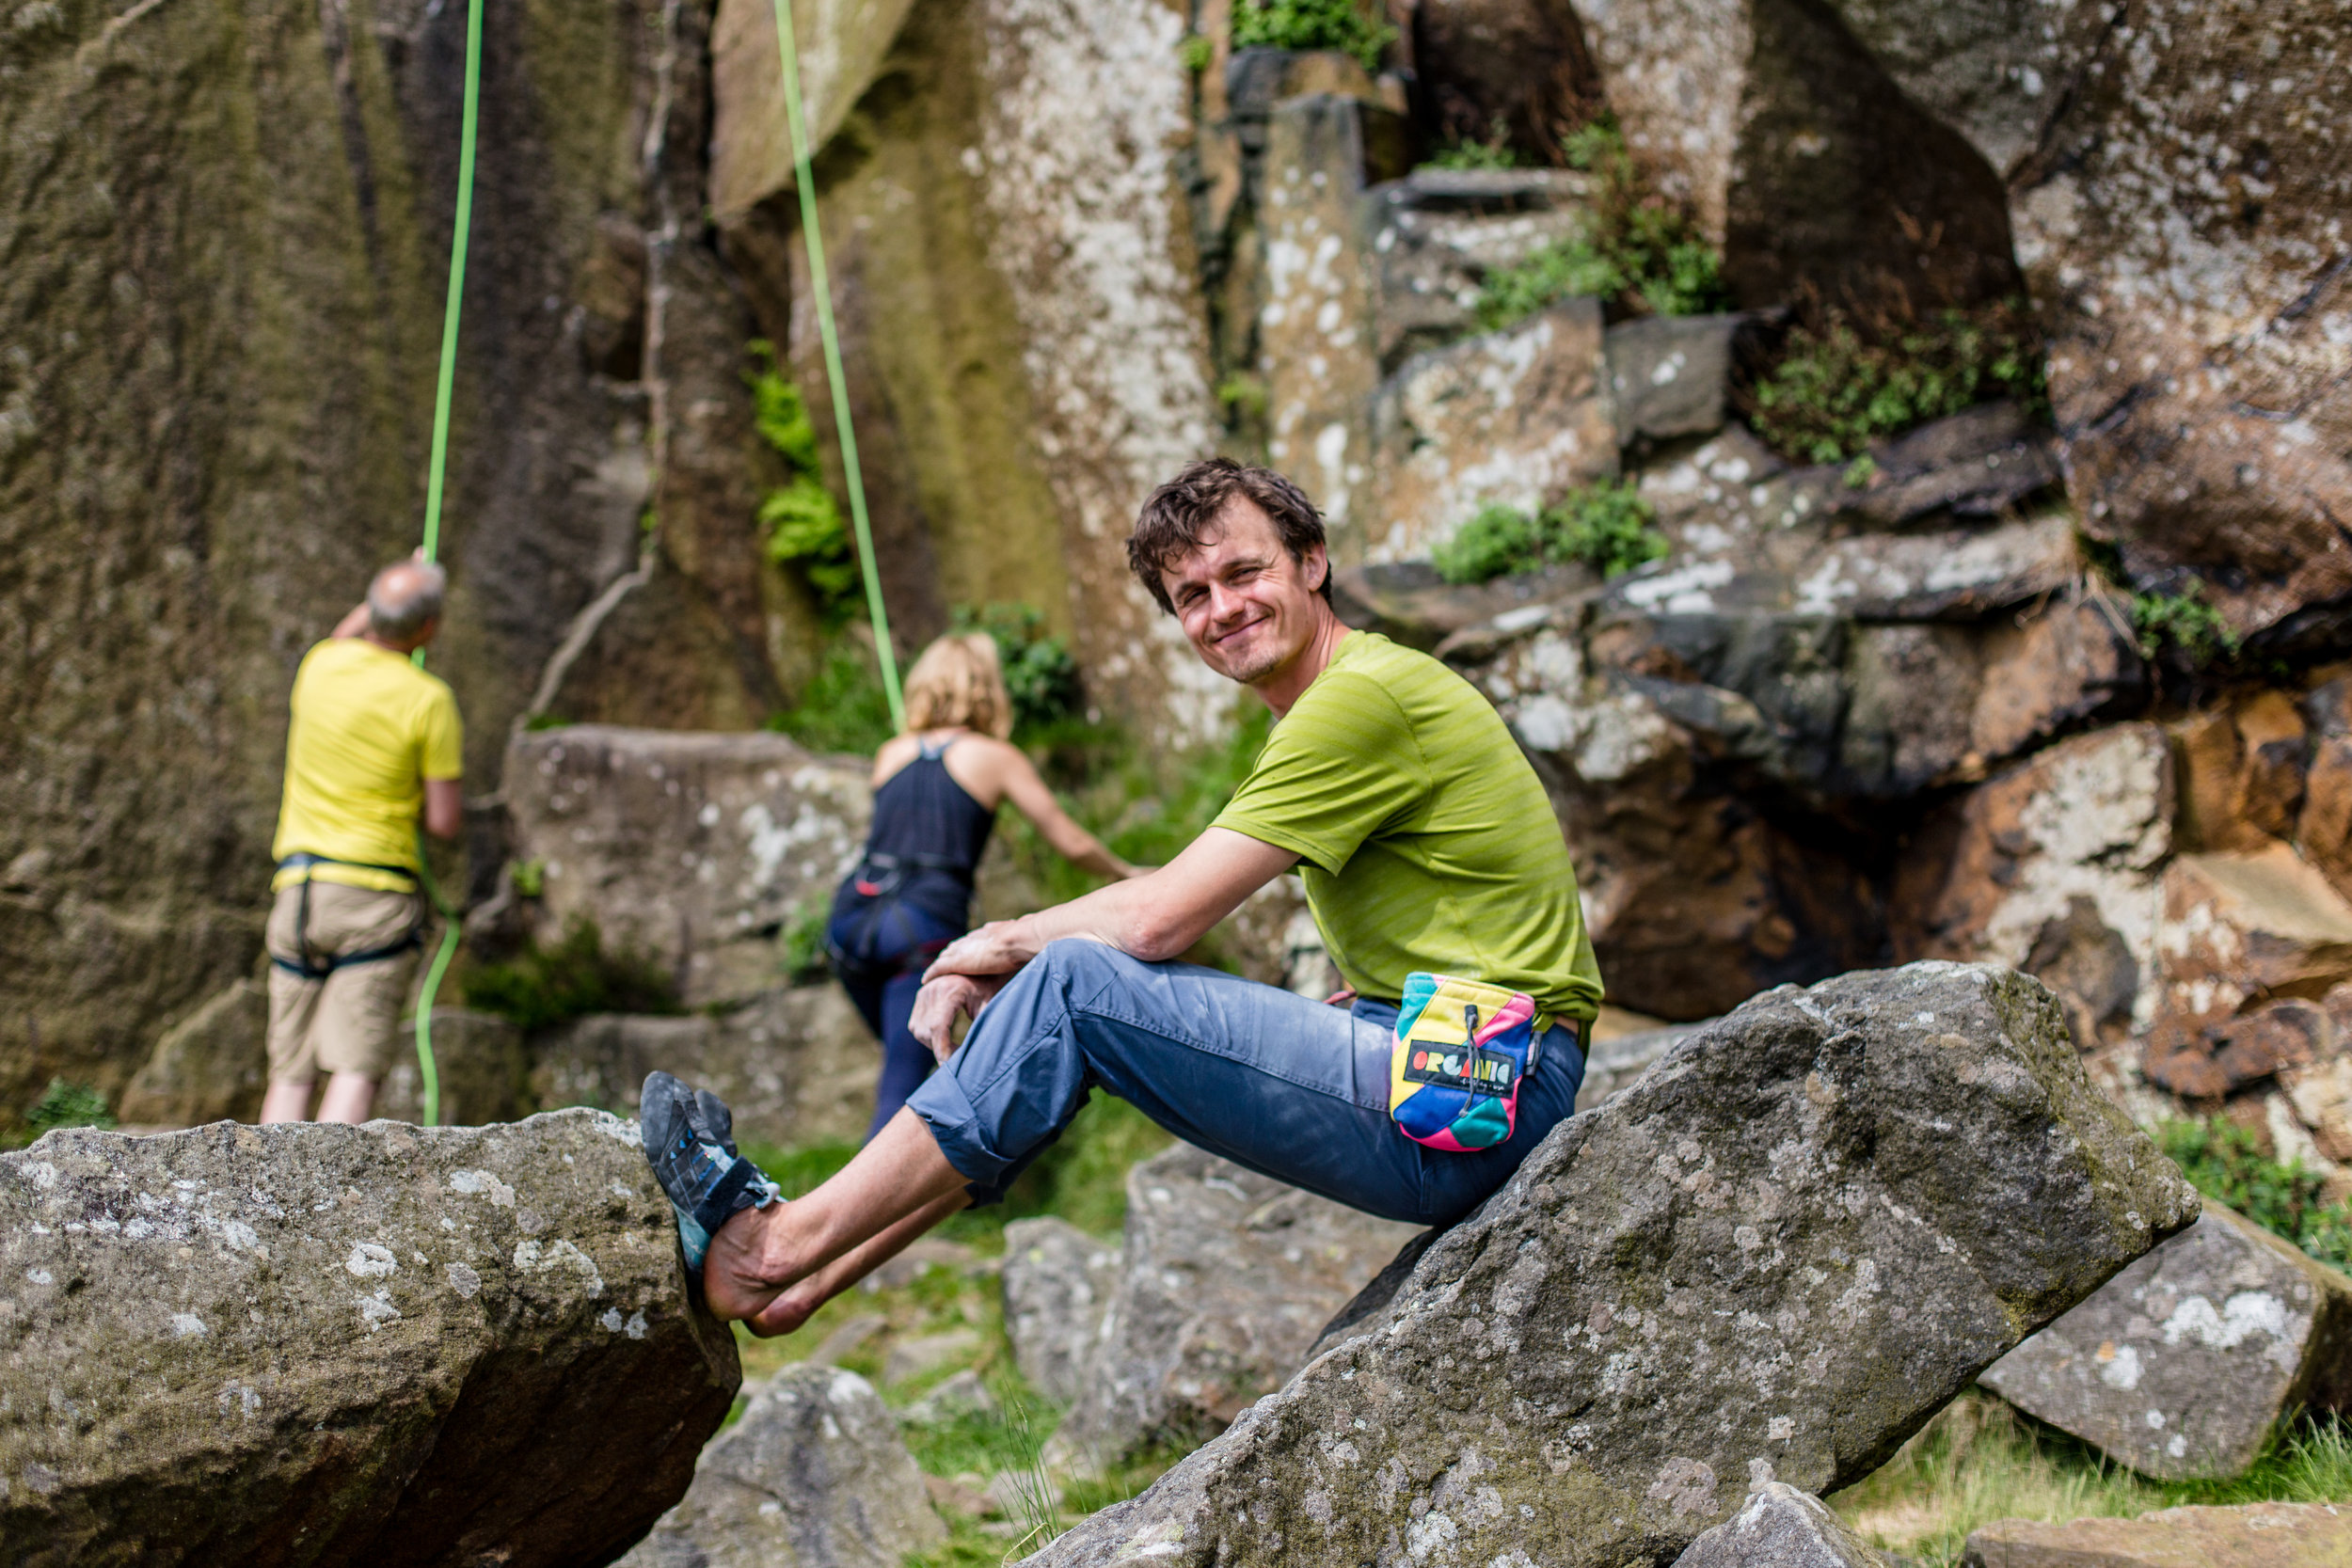 Rob of UK Climbing at the crag